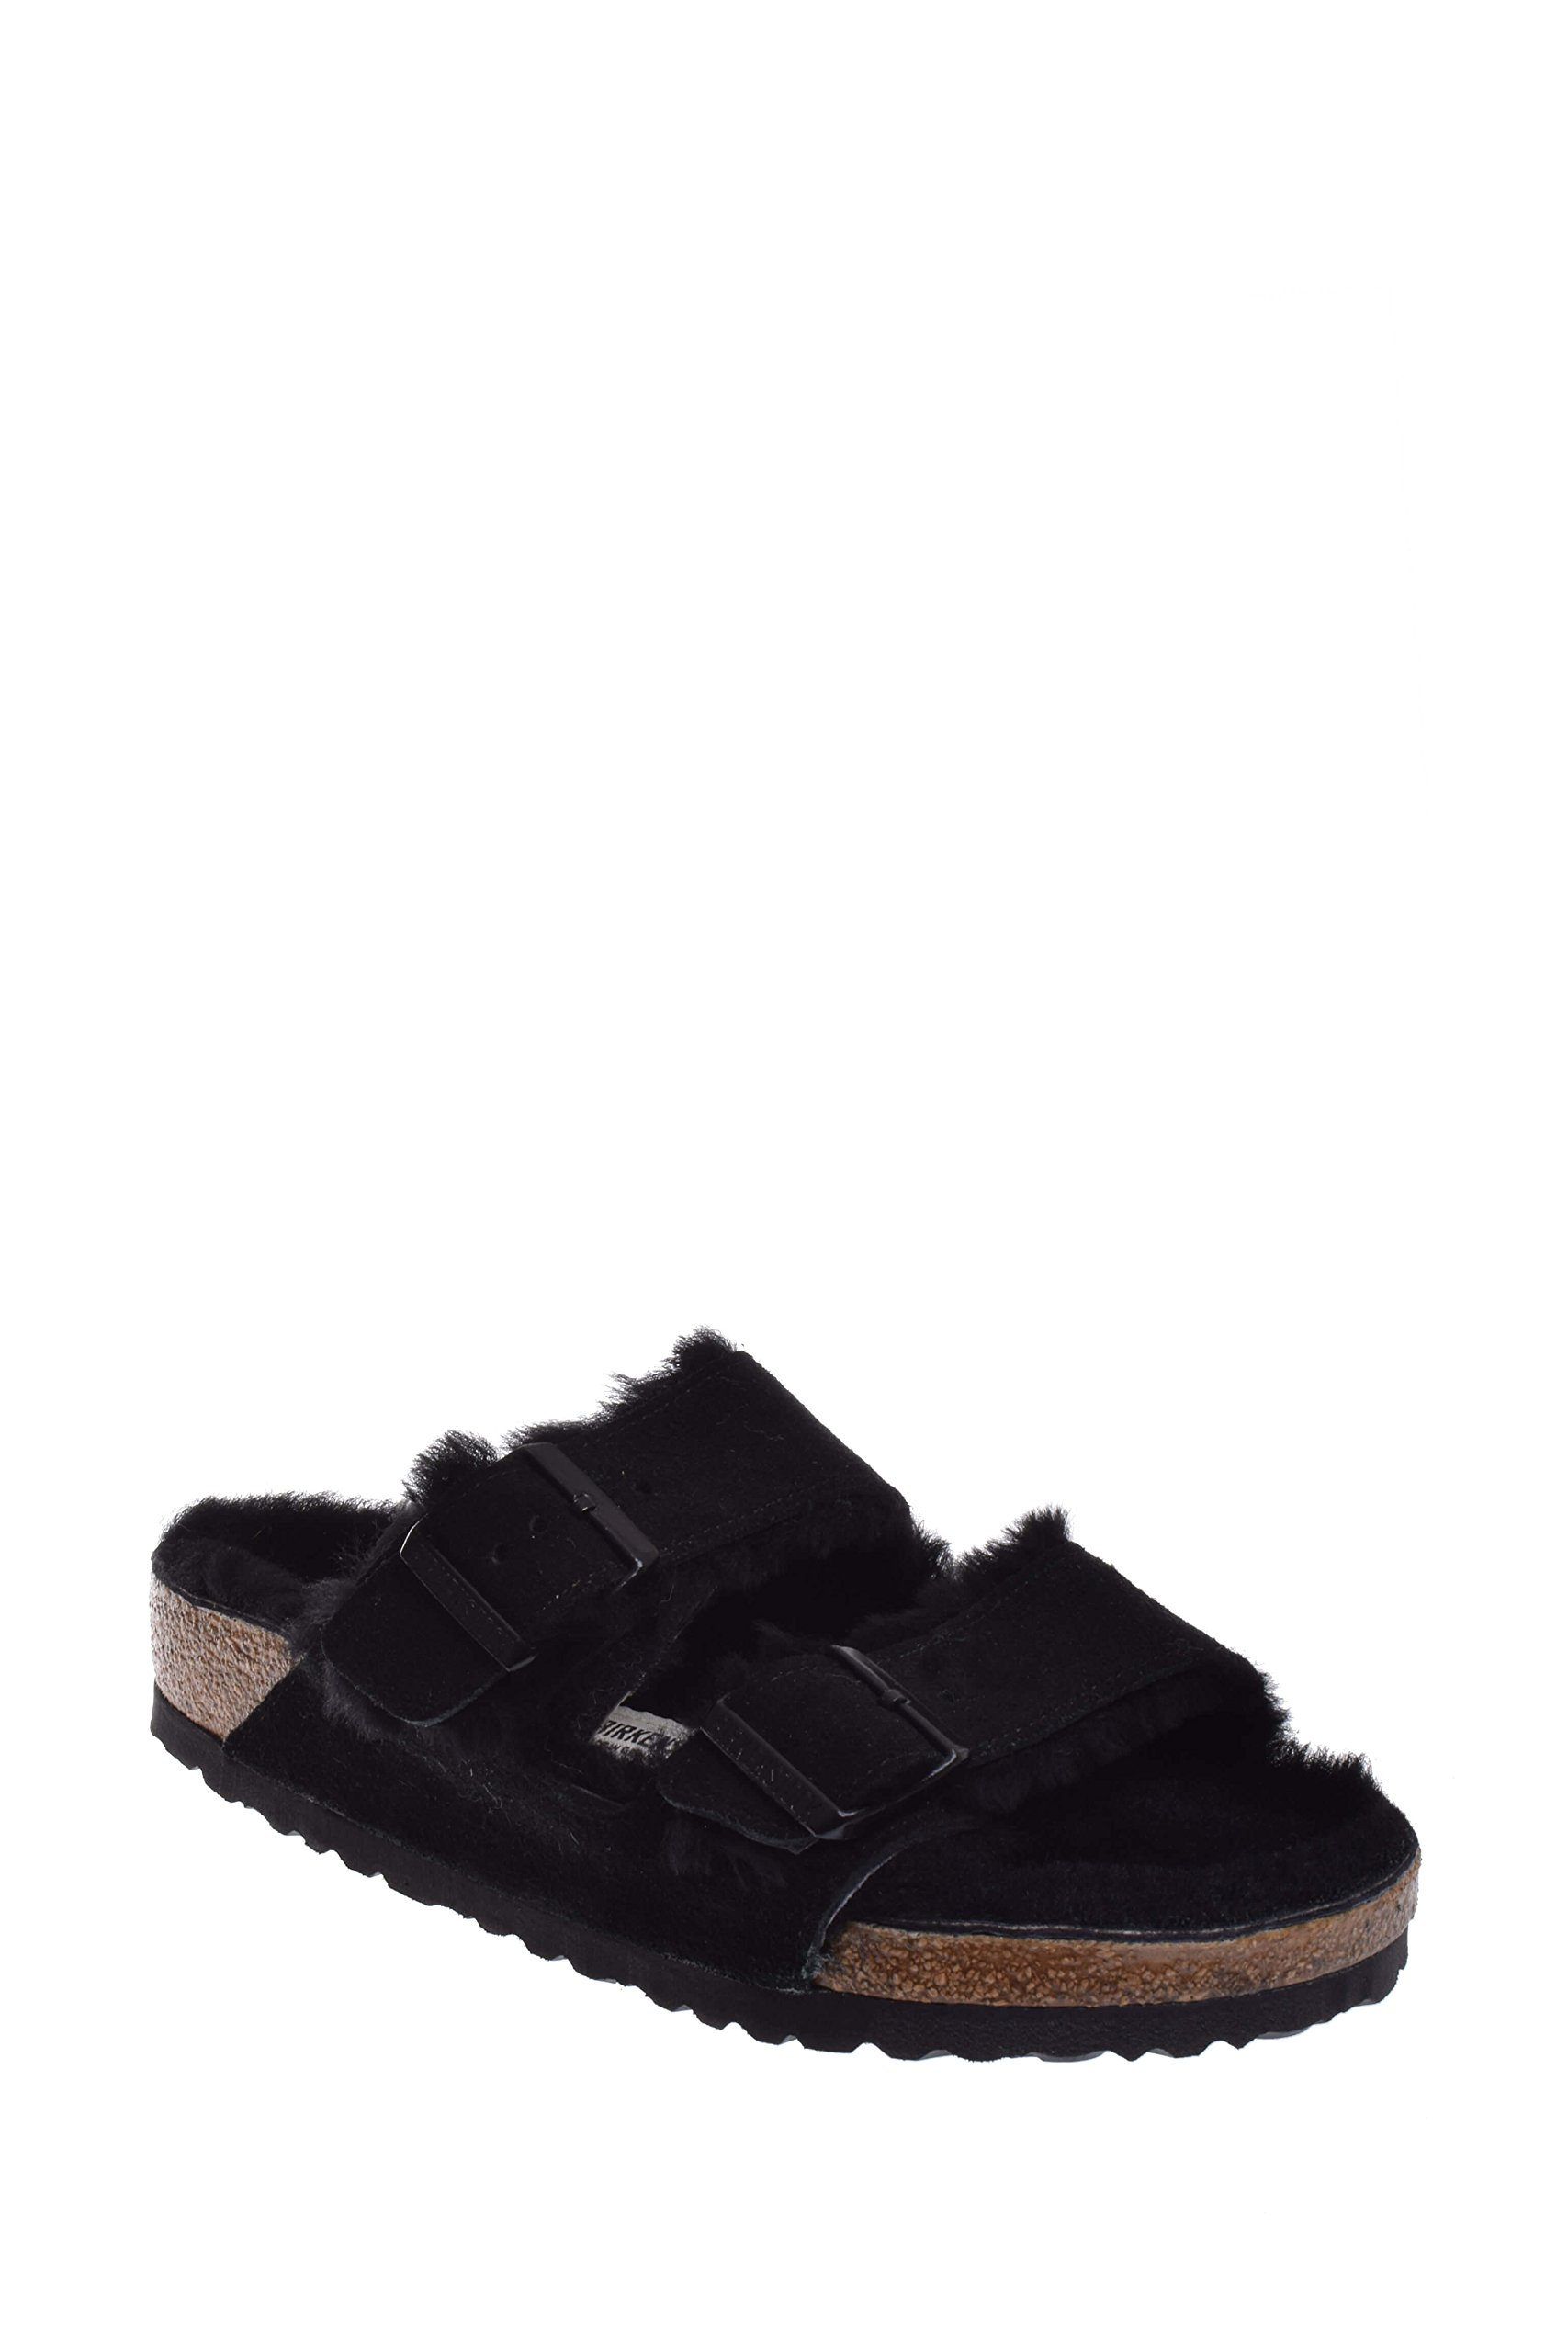 Birkenstock Unisex Arizona Shearling Lined Sandal, Black/Black Suede, 36 M EU